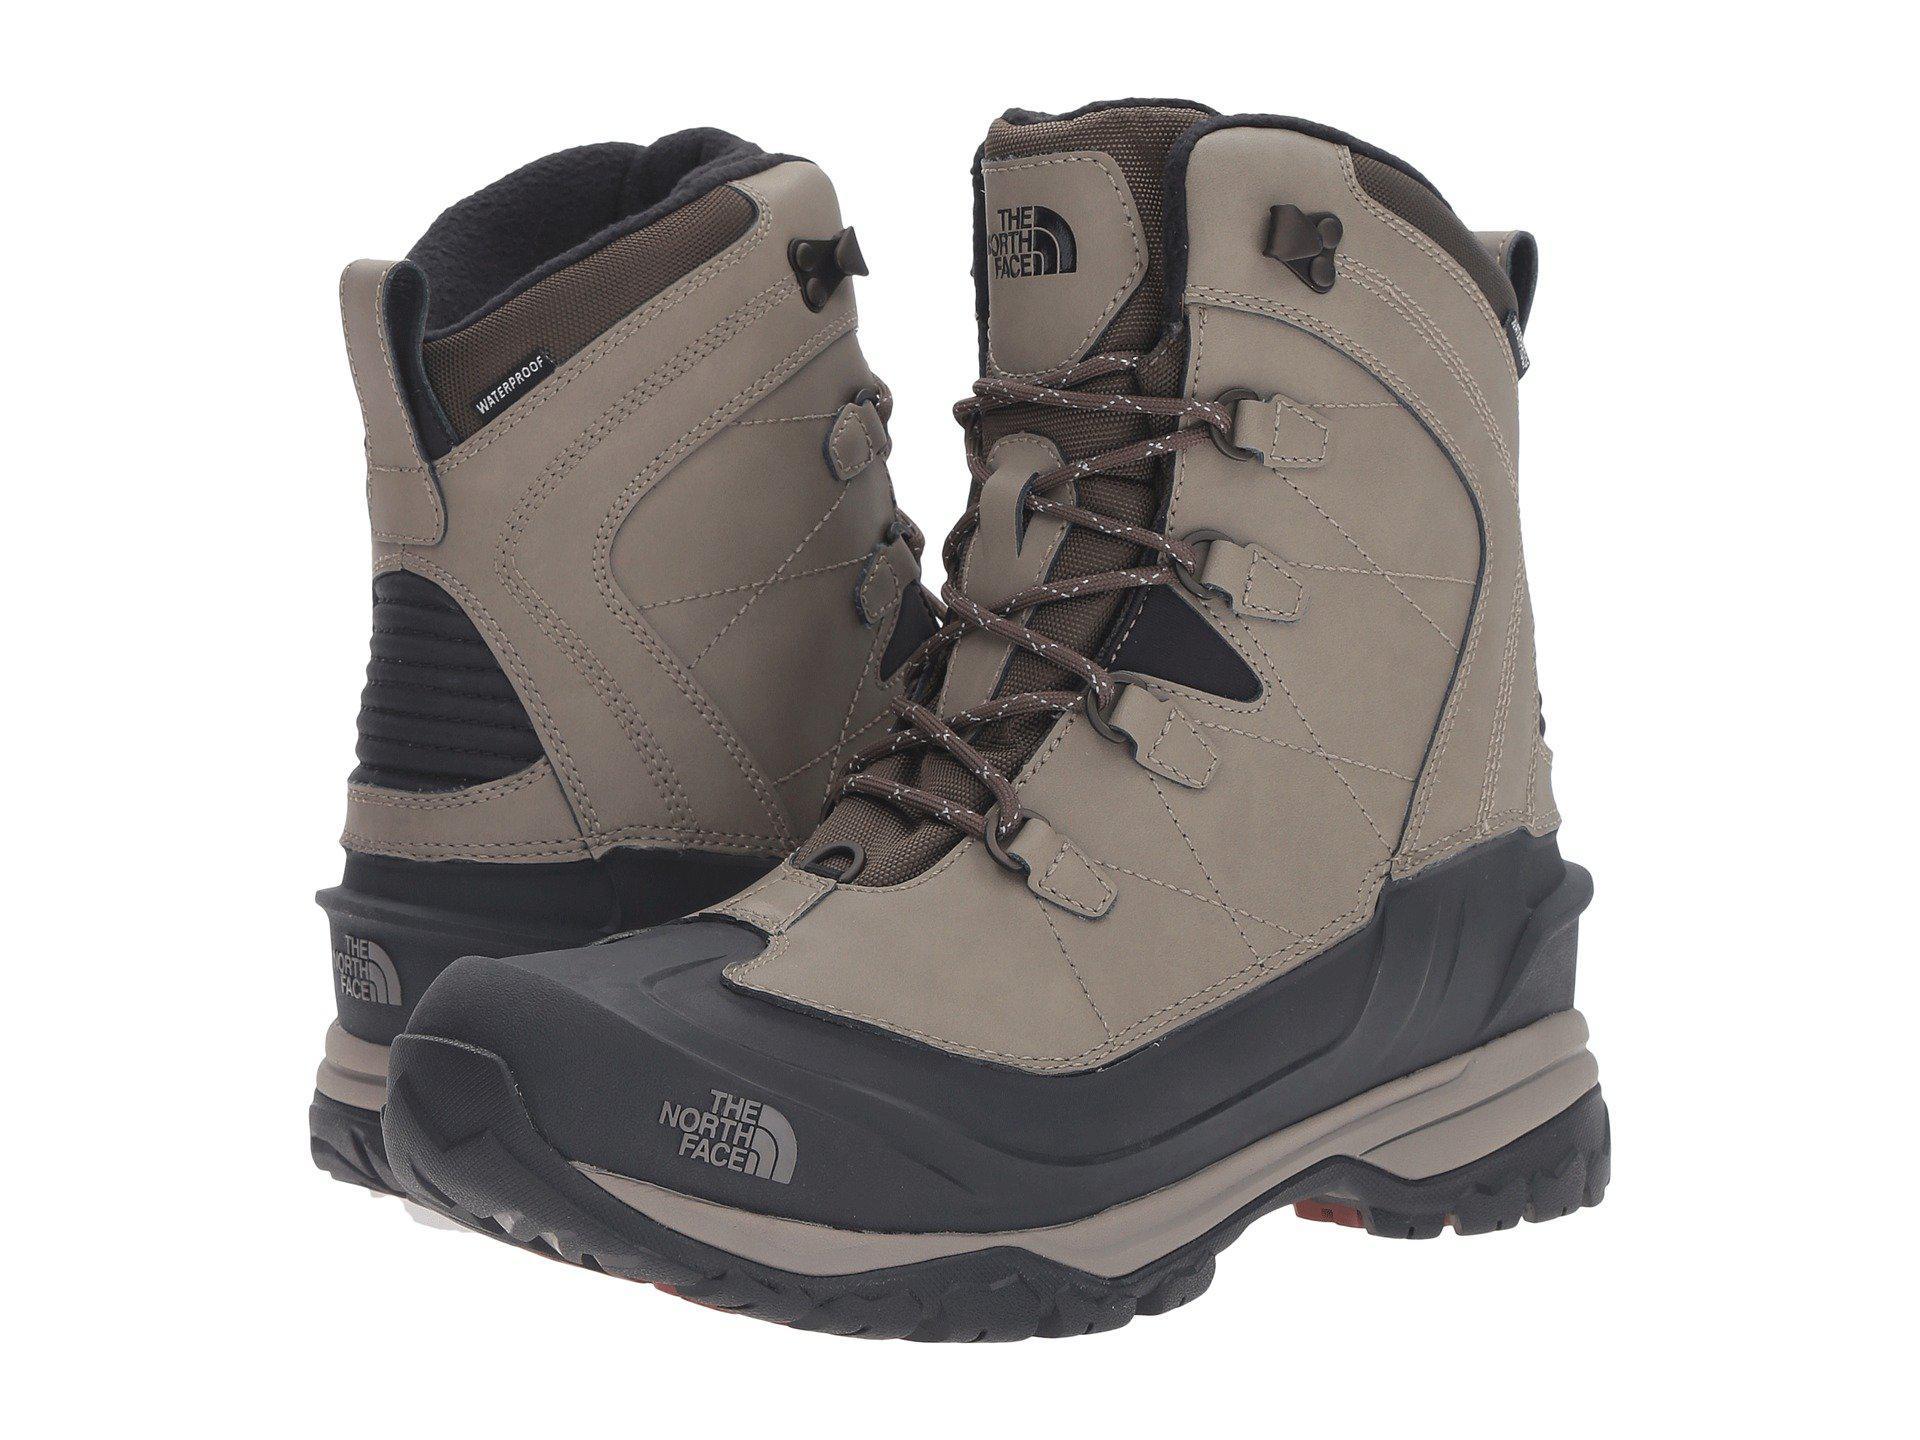 c277c0318 Men's Brown Chilkat Evo